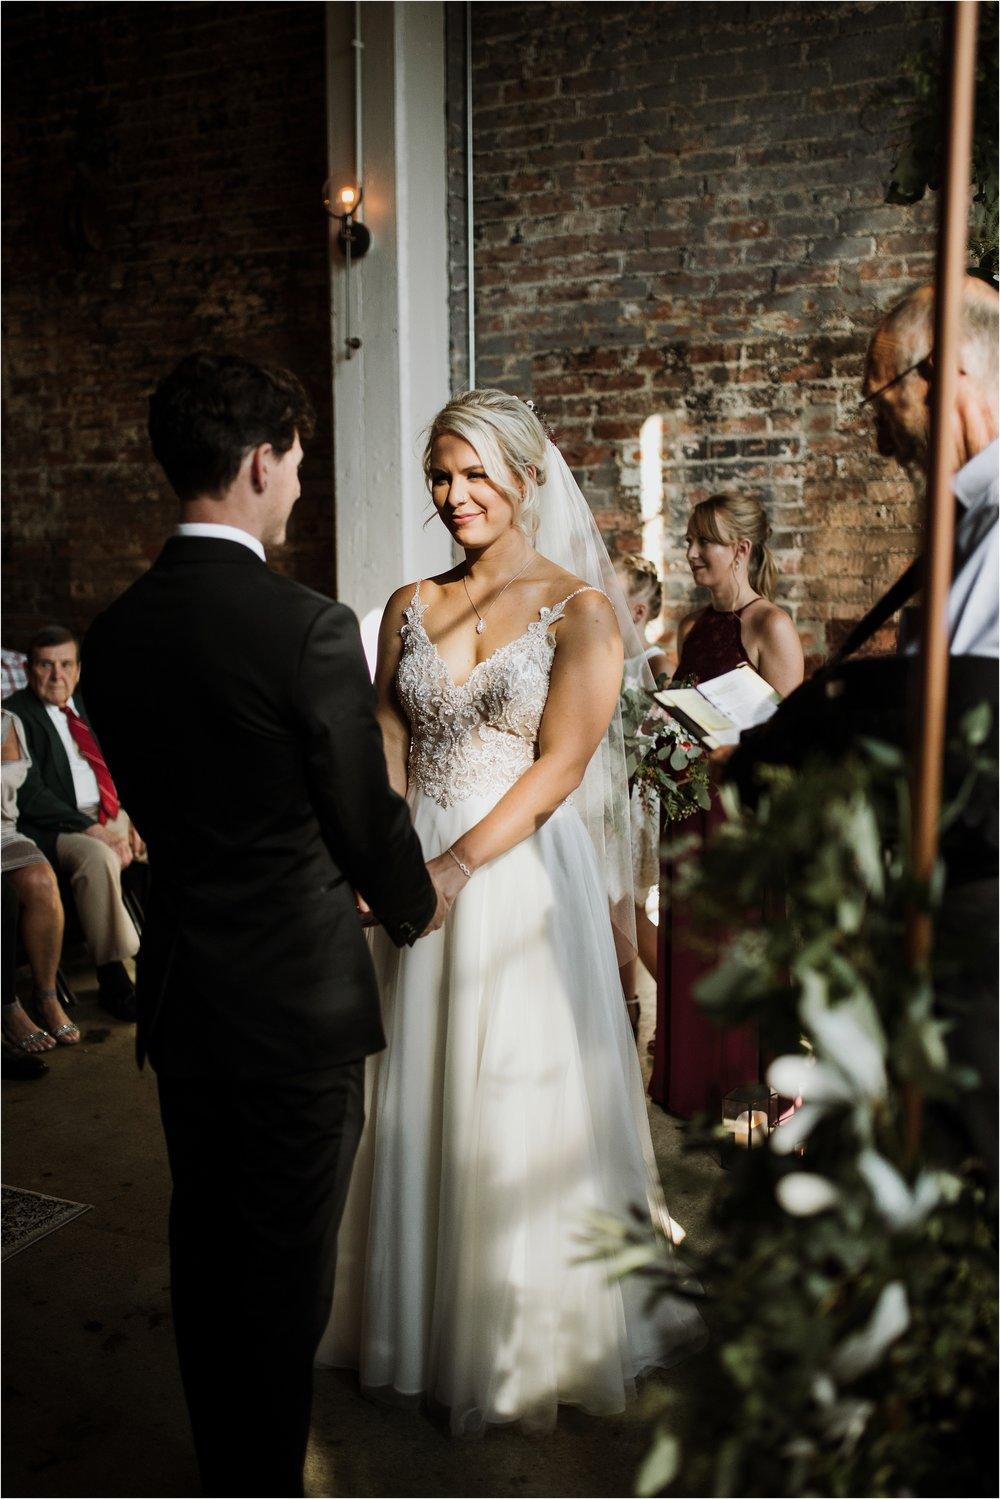 the-skeleton-root-wedding-photography-_0018.jpg